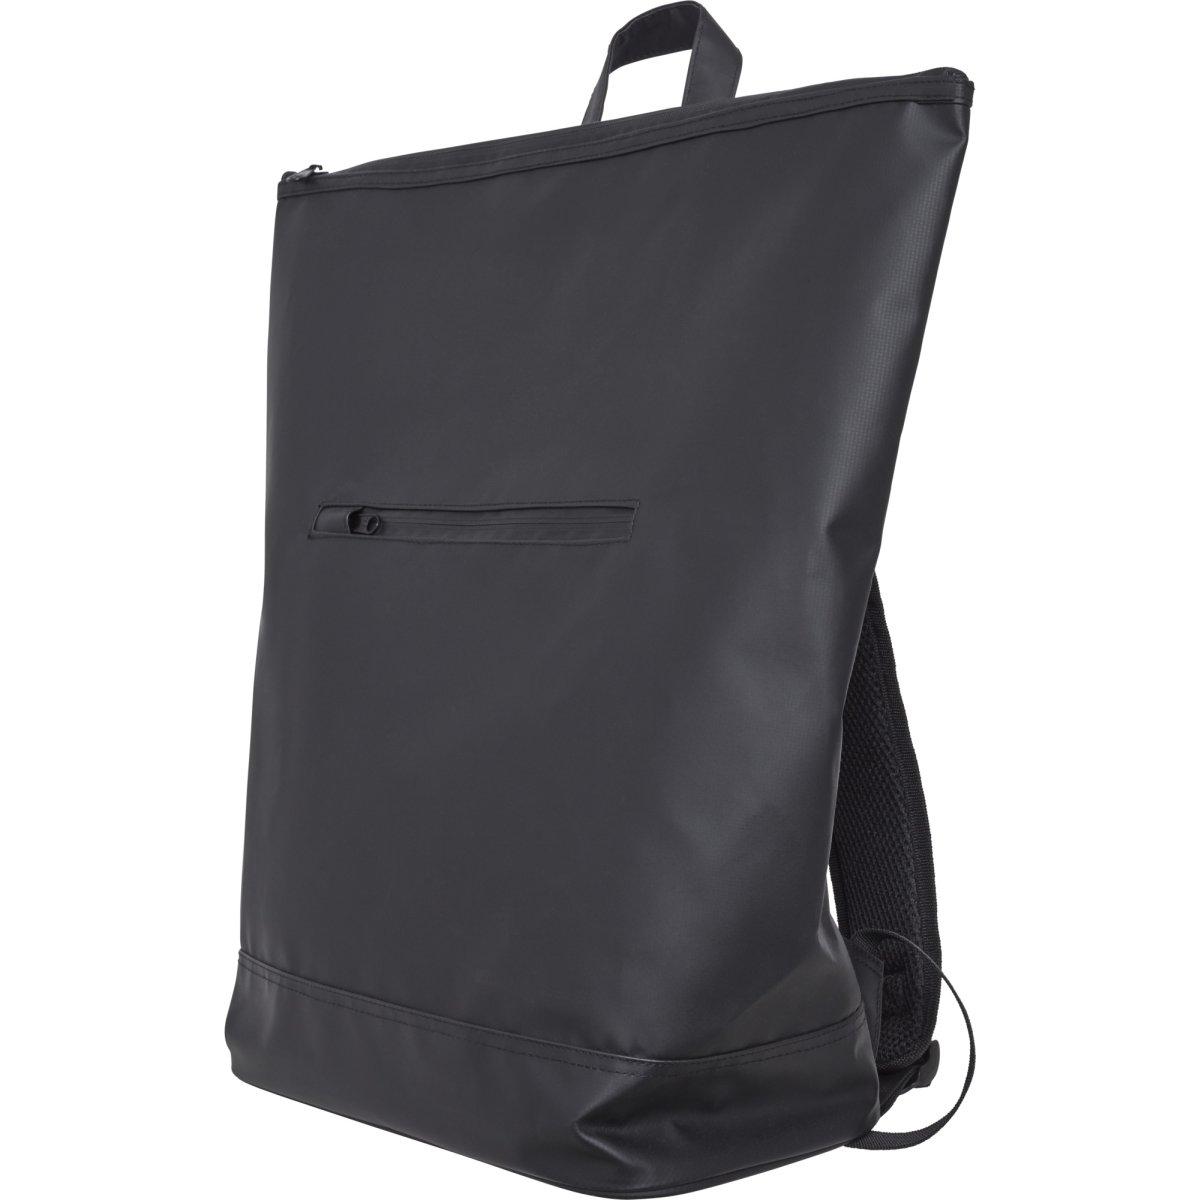 Backpack Classics Schwarz Messenger Rucksack Urban Tasche roCedxQBW